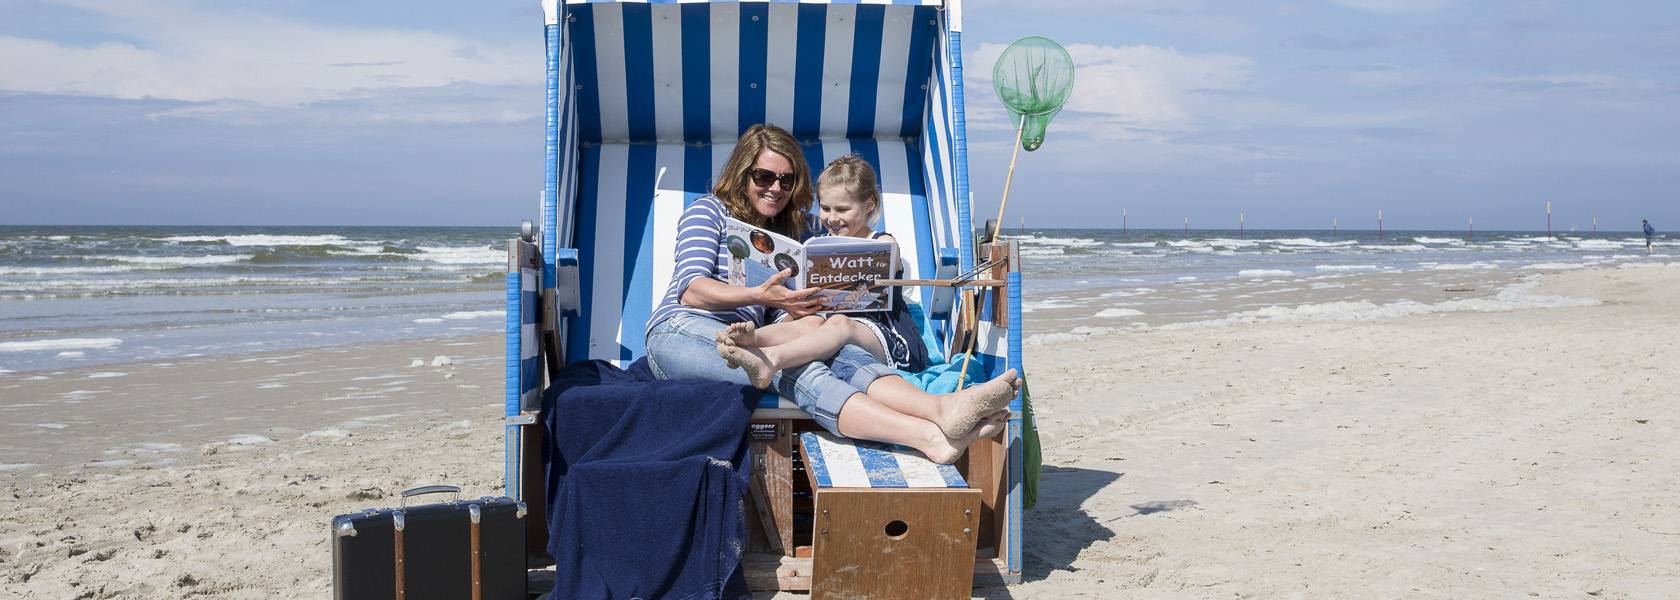 Entspannen im Strandkorb, © Martin Stöver